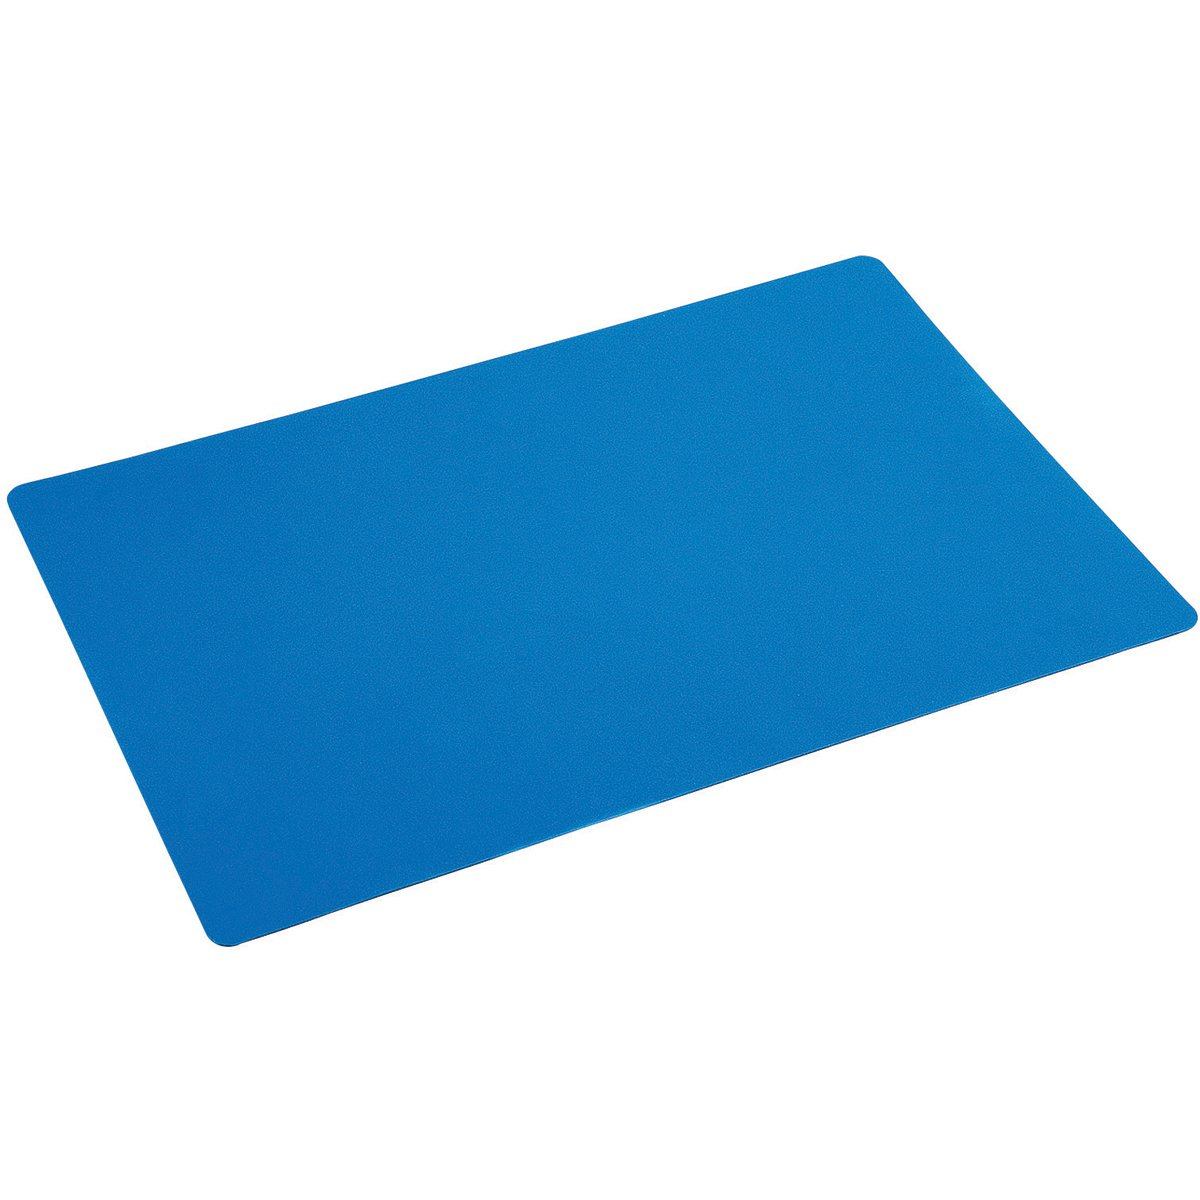 Wilton Easy Flex Silicone 10-Inch by 15-Inch Mat 2105-4808